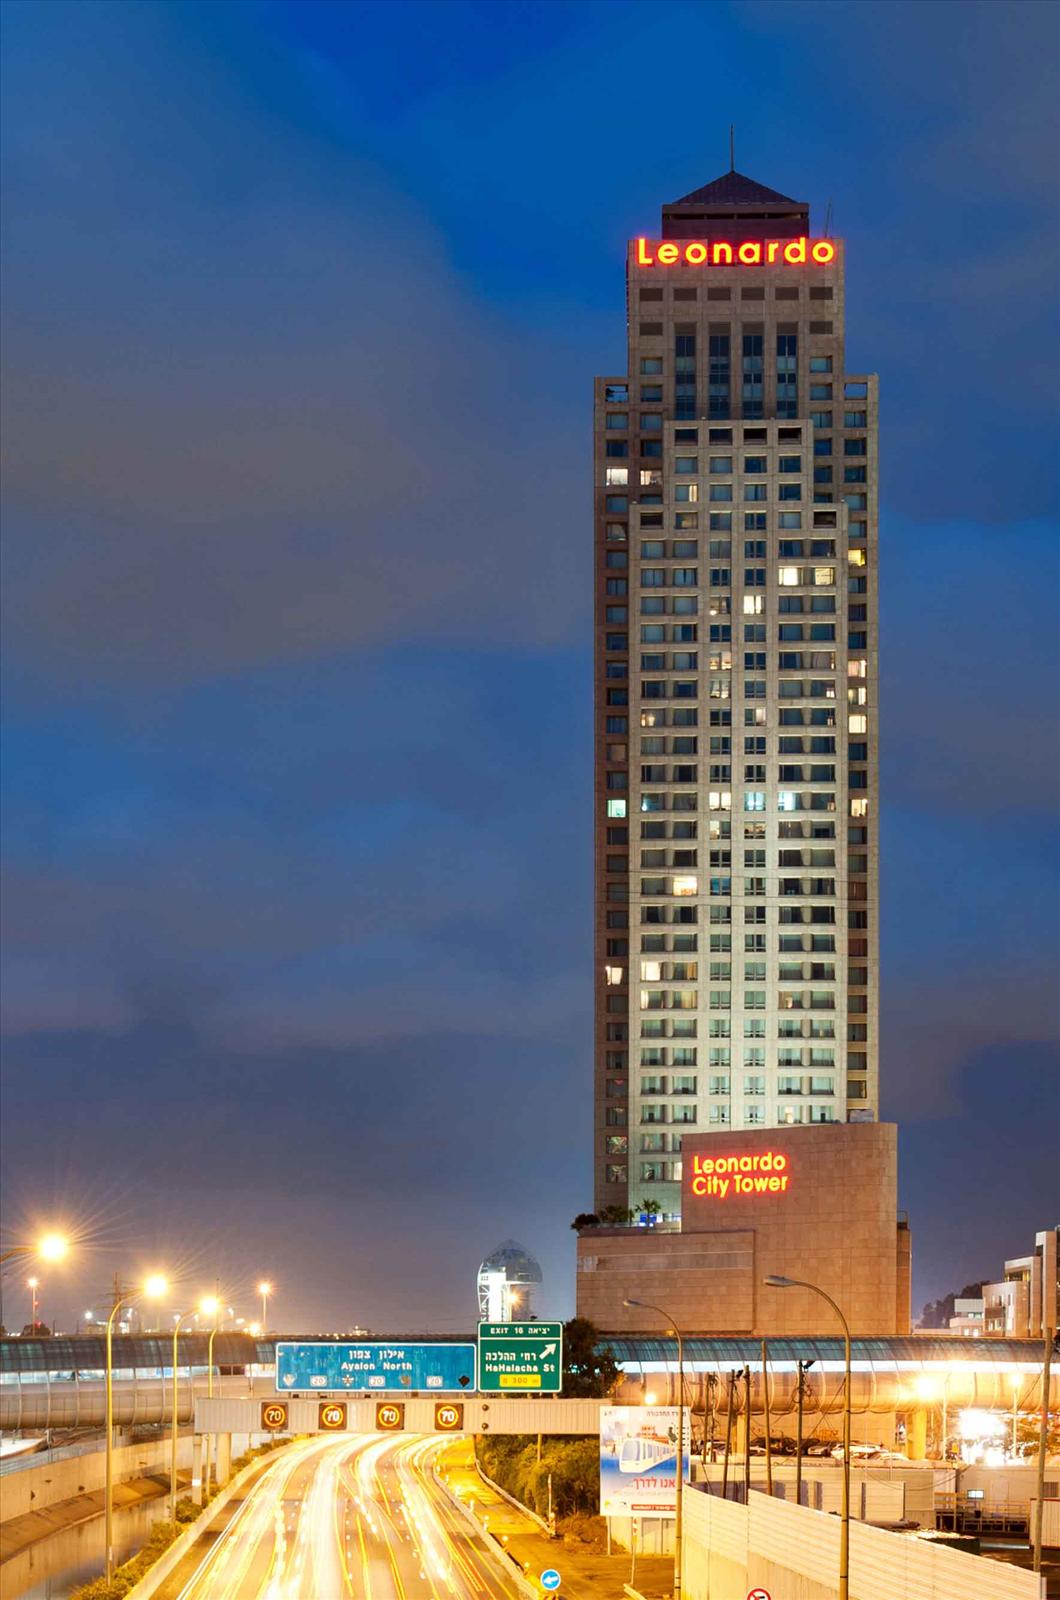 Leonardo City Tower